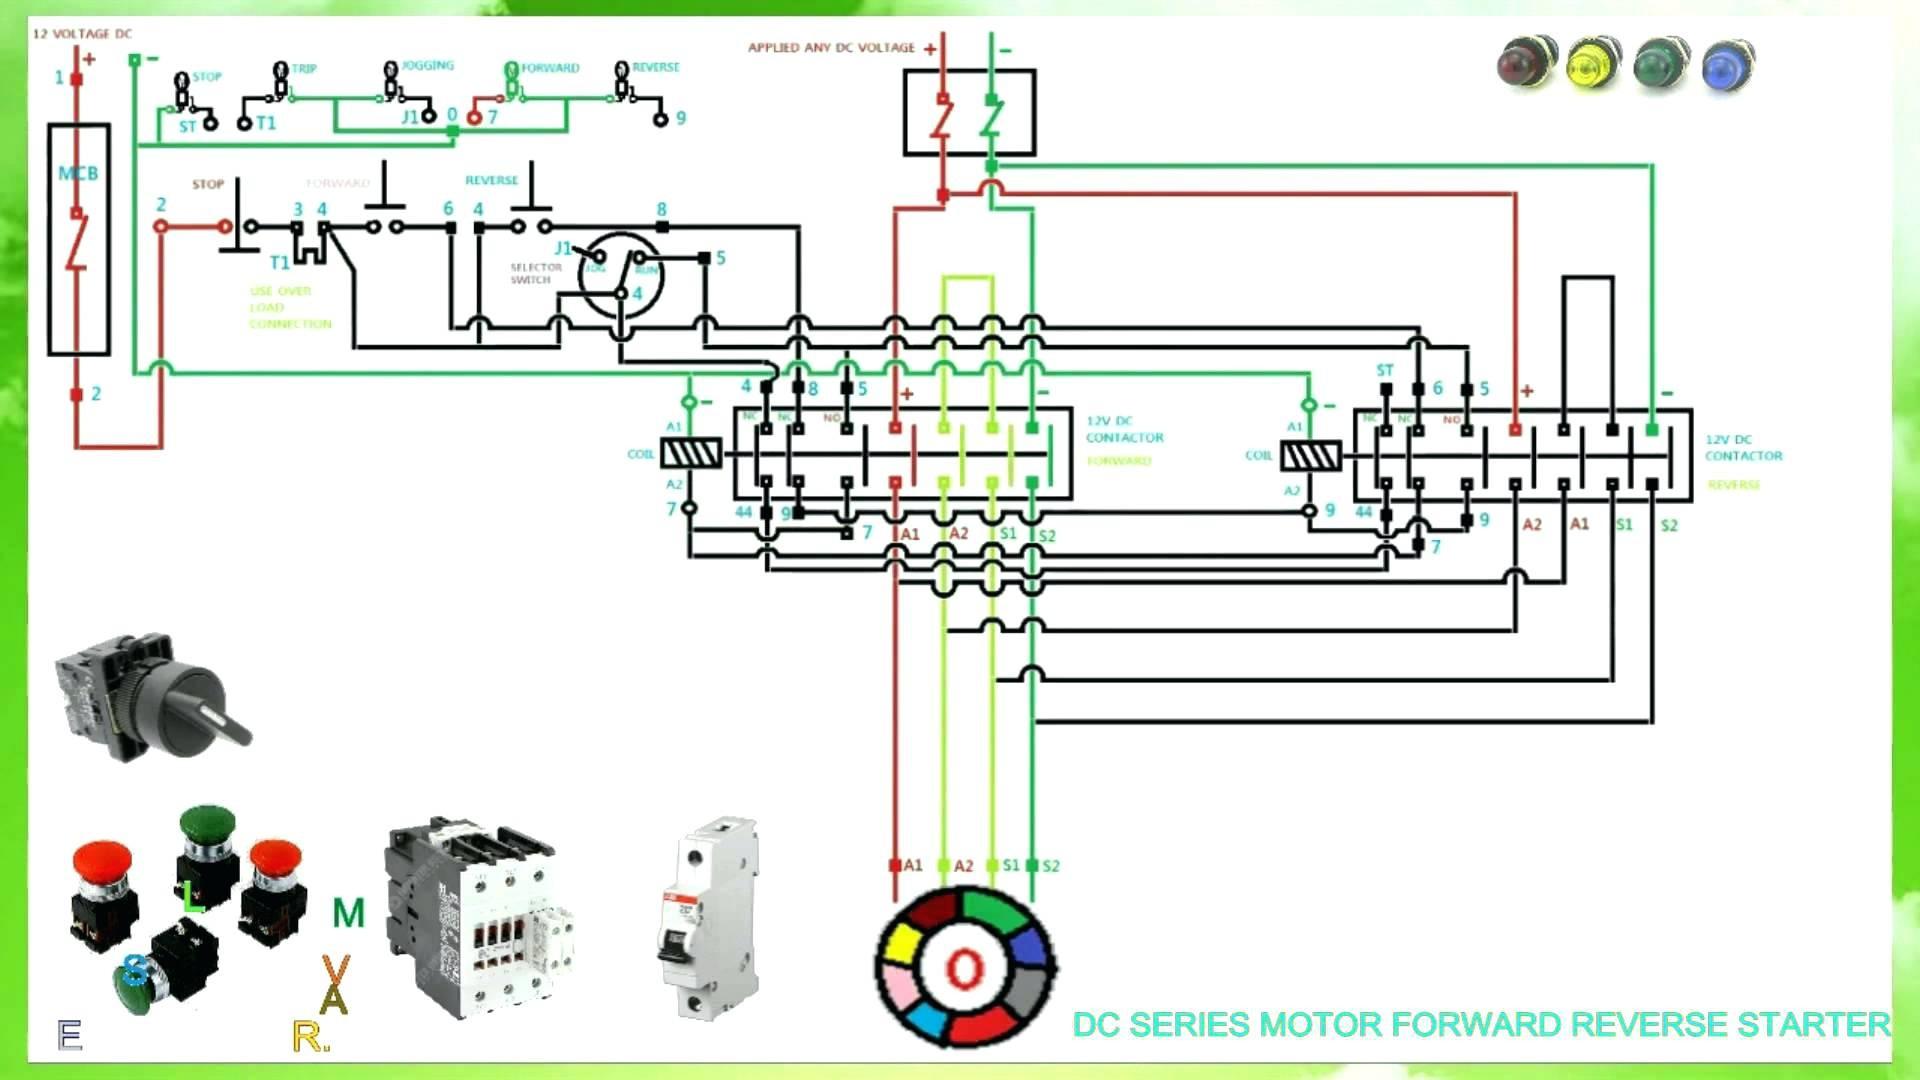 da6f6 circuit diagram 3 phase motor forward reverse wiring single phase forward reverse motor control diagram three phase motor braking circuit